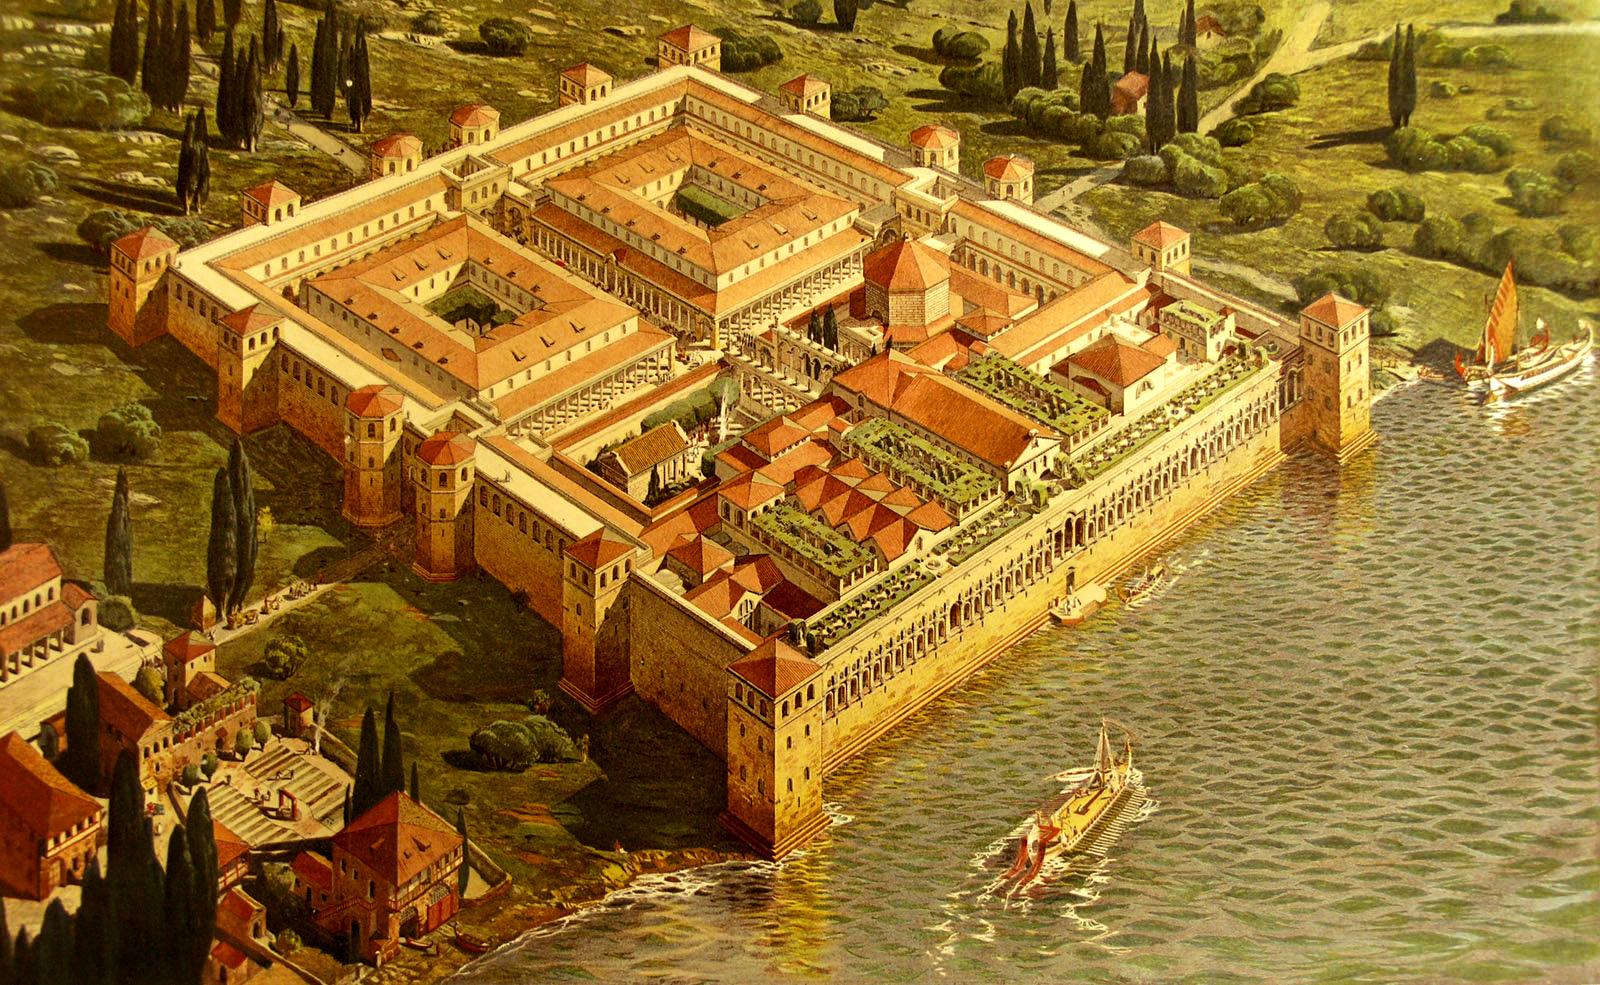 palace in Nicomedia